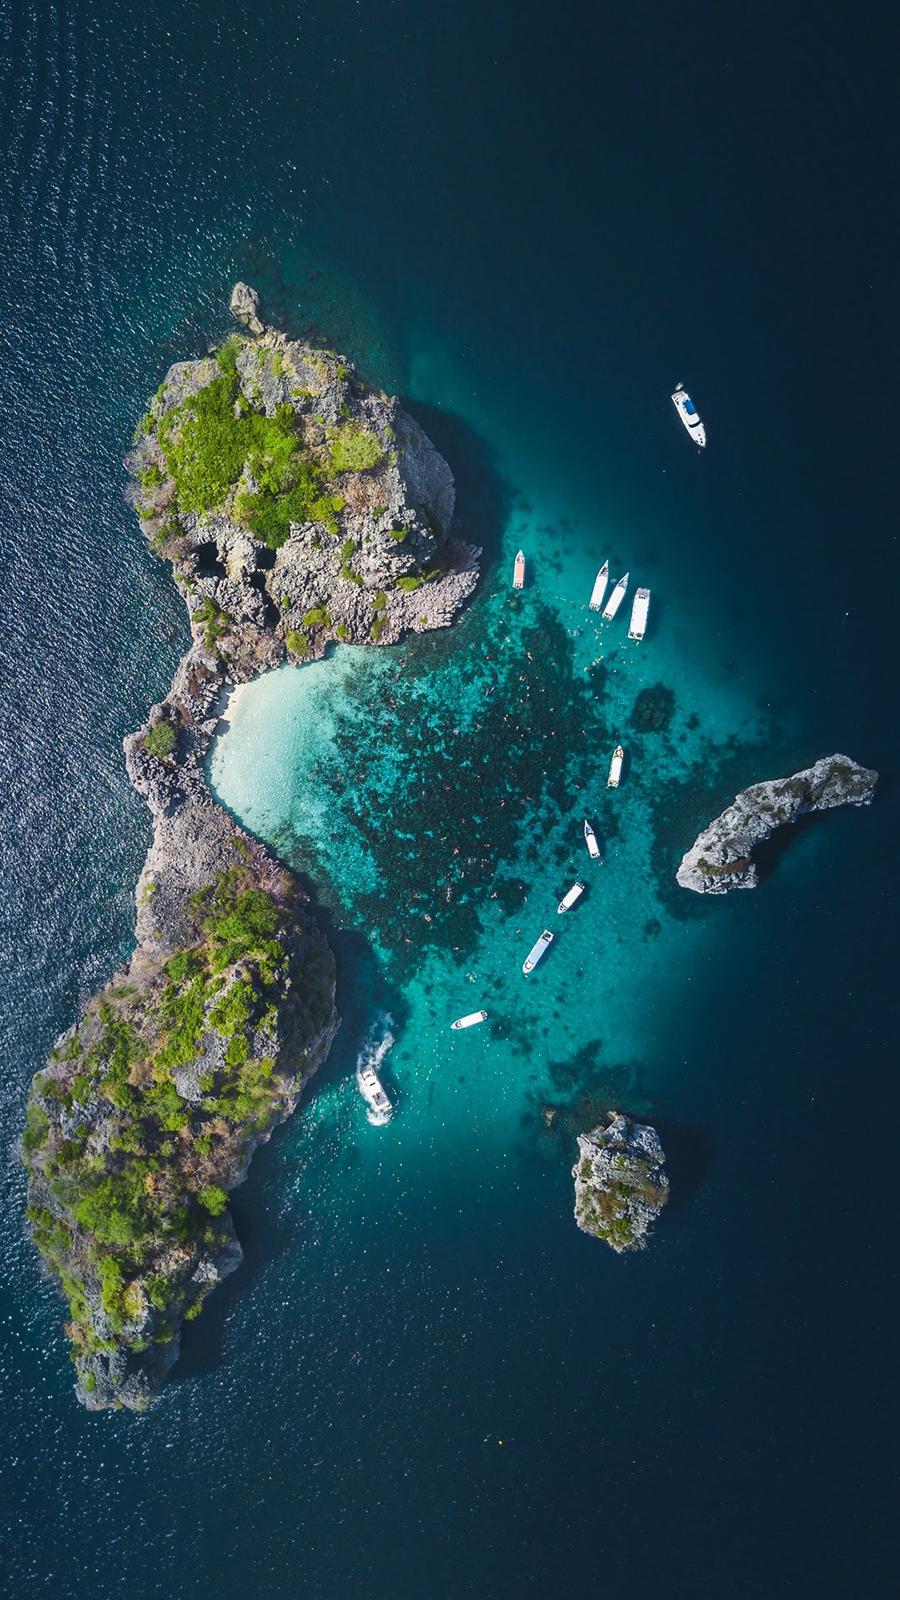 Island Wallpaper – Nature, Sea, Mountain, Island Wallpapers Free Download